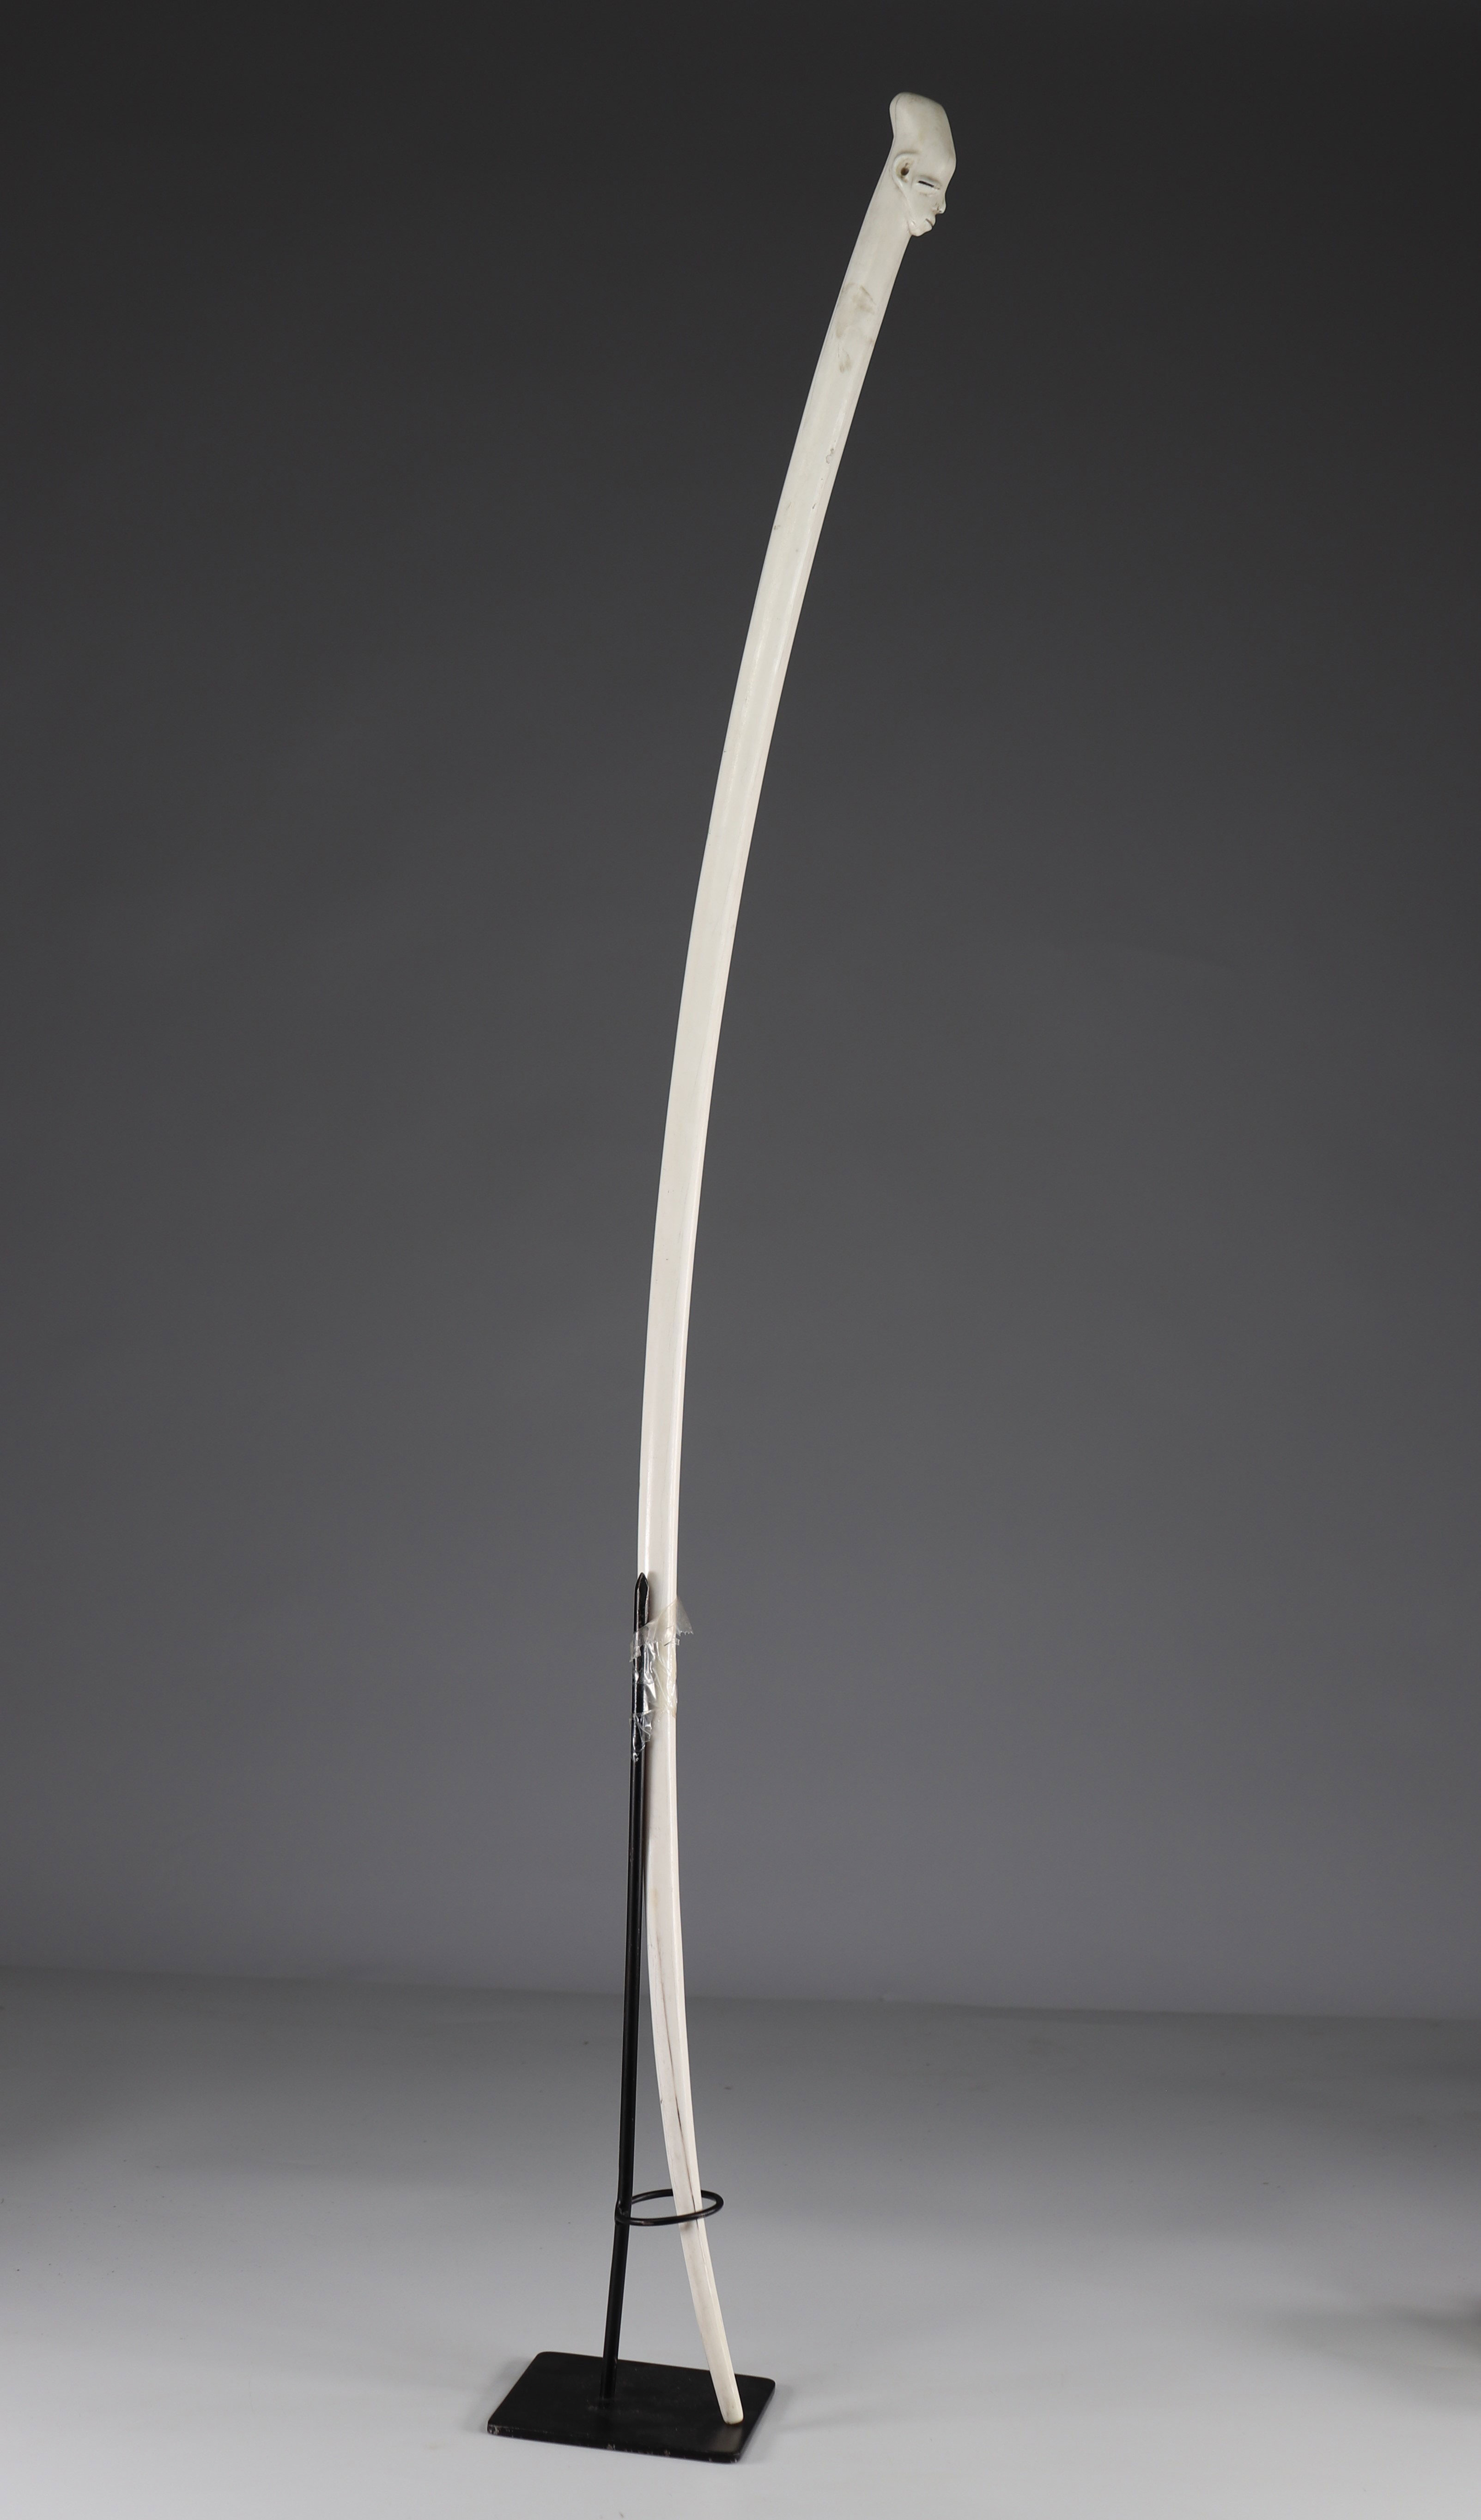 Rare prestige Mangbetu scepter in ivory -. Early 20th - Ground floor